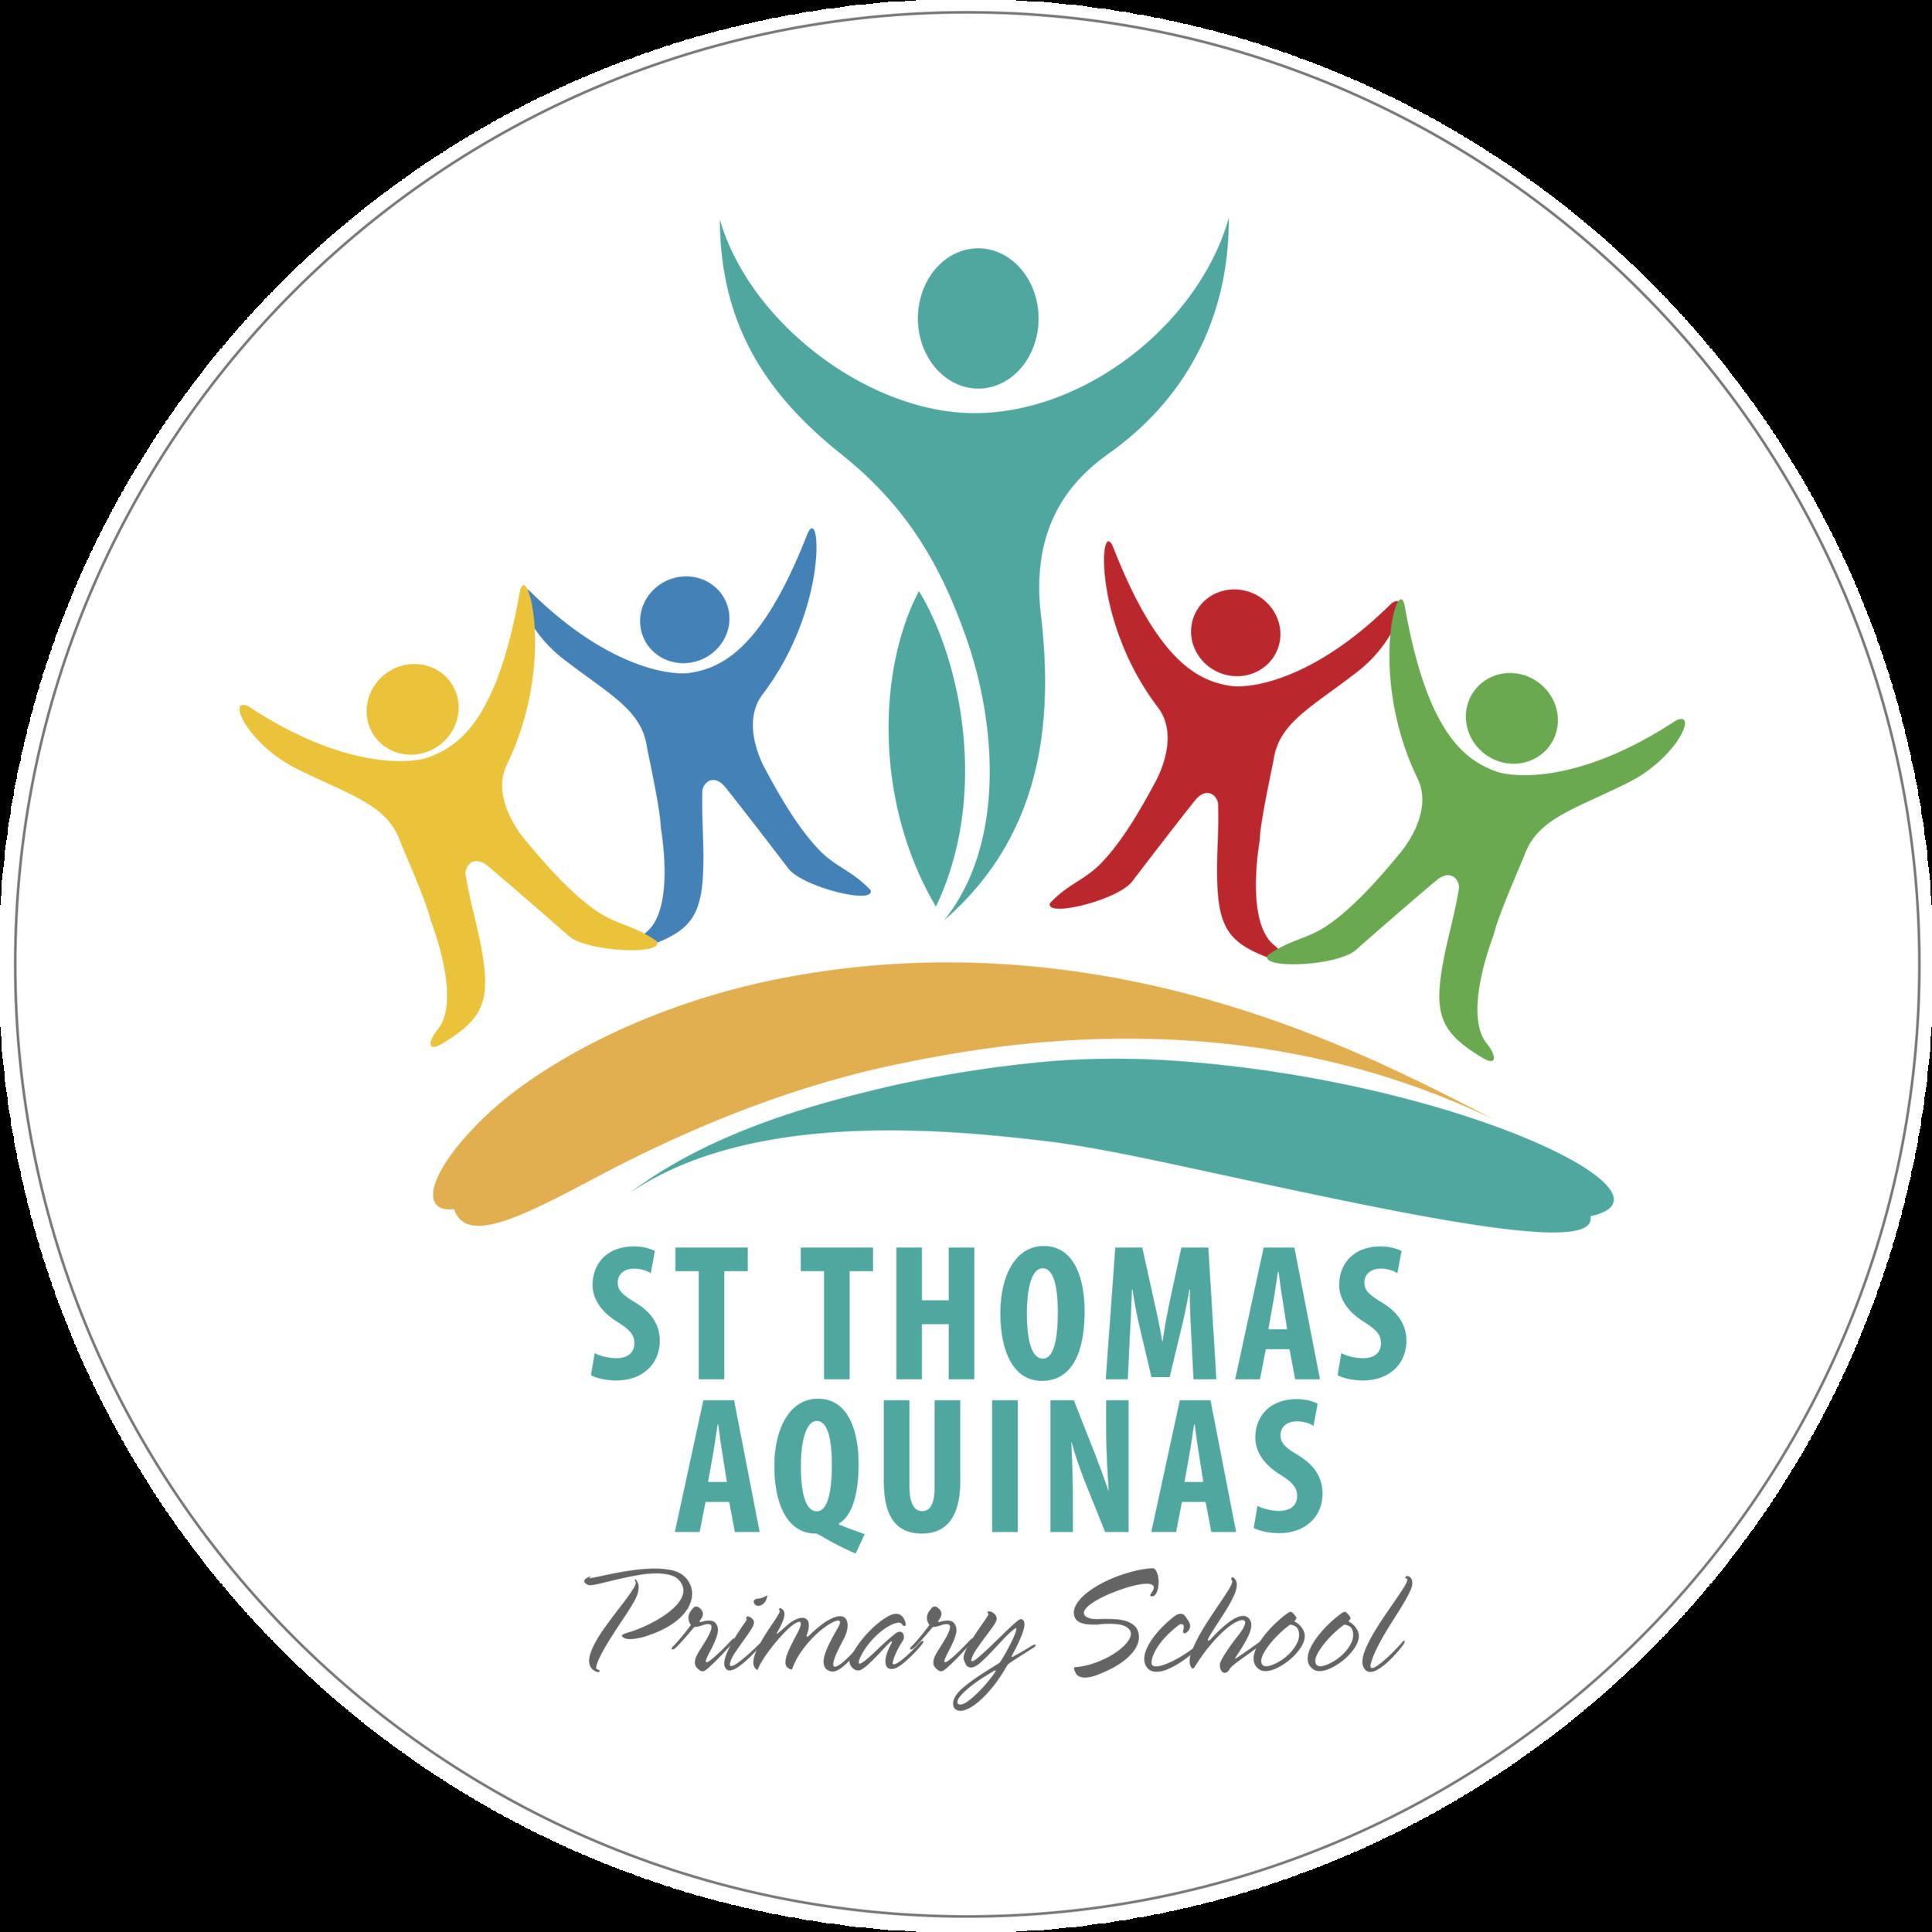 St Thomas Aquinas Primary School